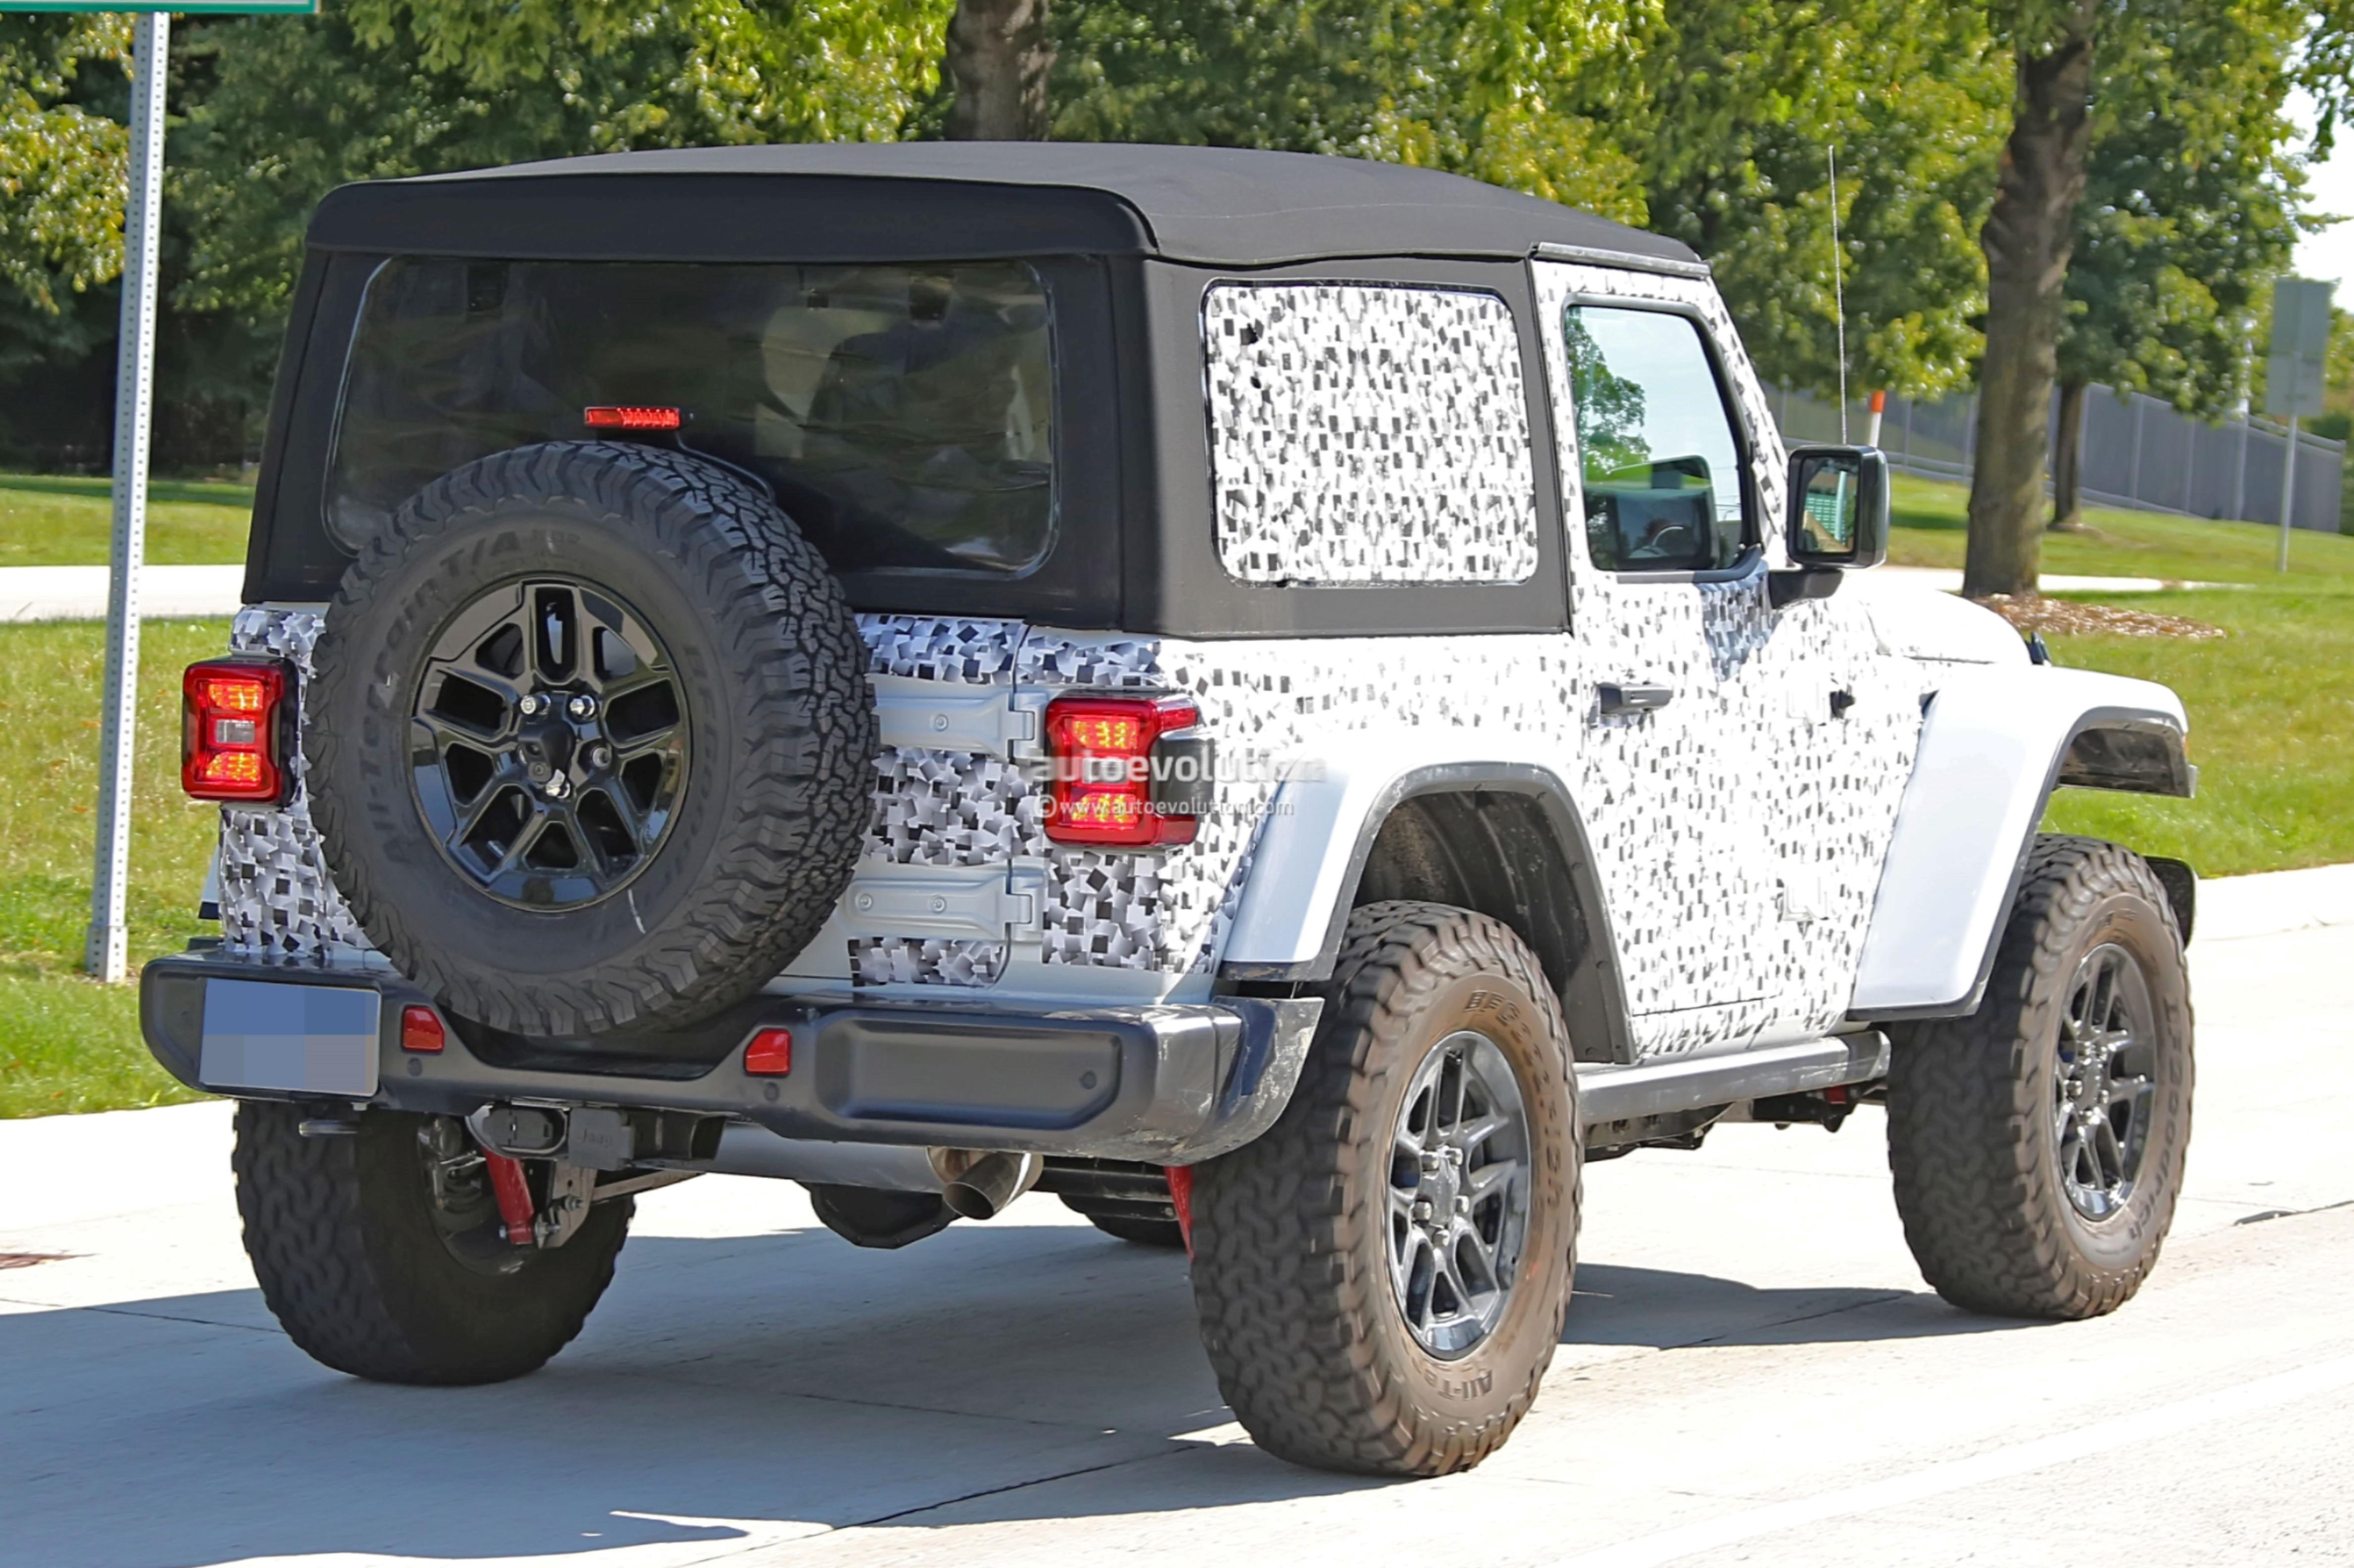 2018 jeep wrangler  jl  jlu  leaked through owner u2019s manual jeep wrangler manual 2018 jeep wrangler manual 2018